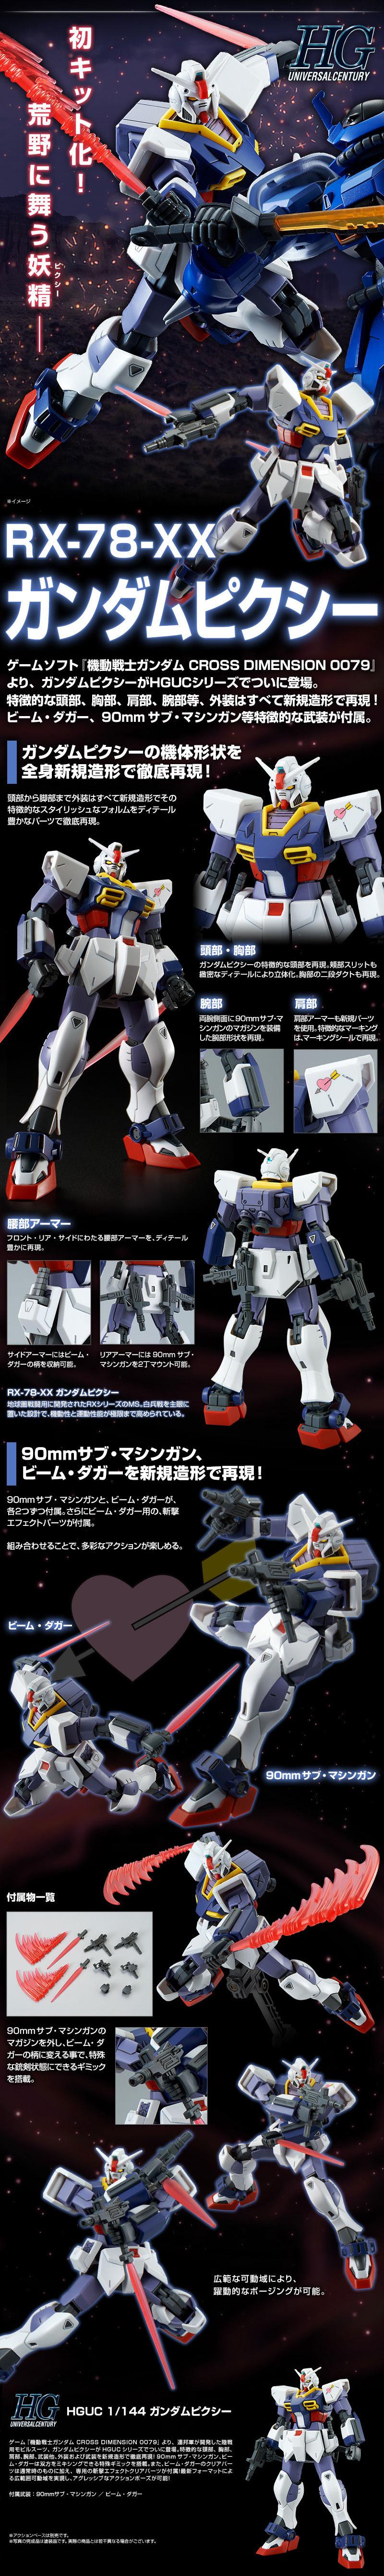 HGUC Gundam Pixie Details